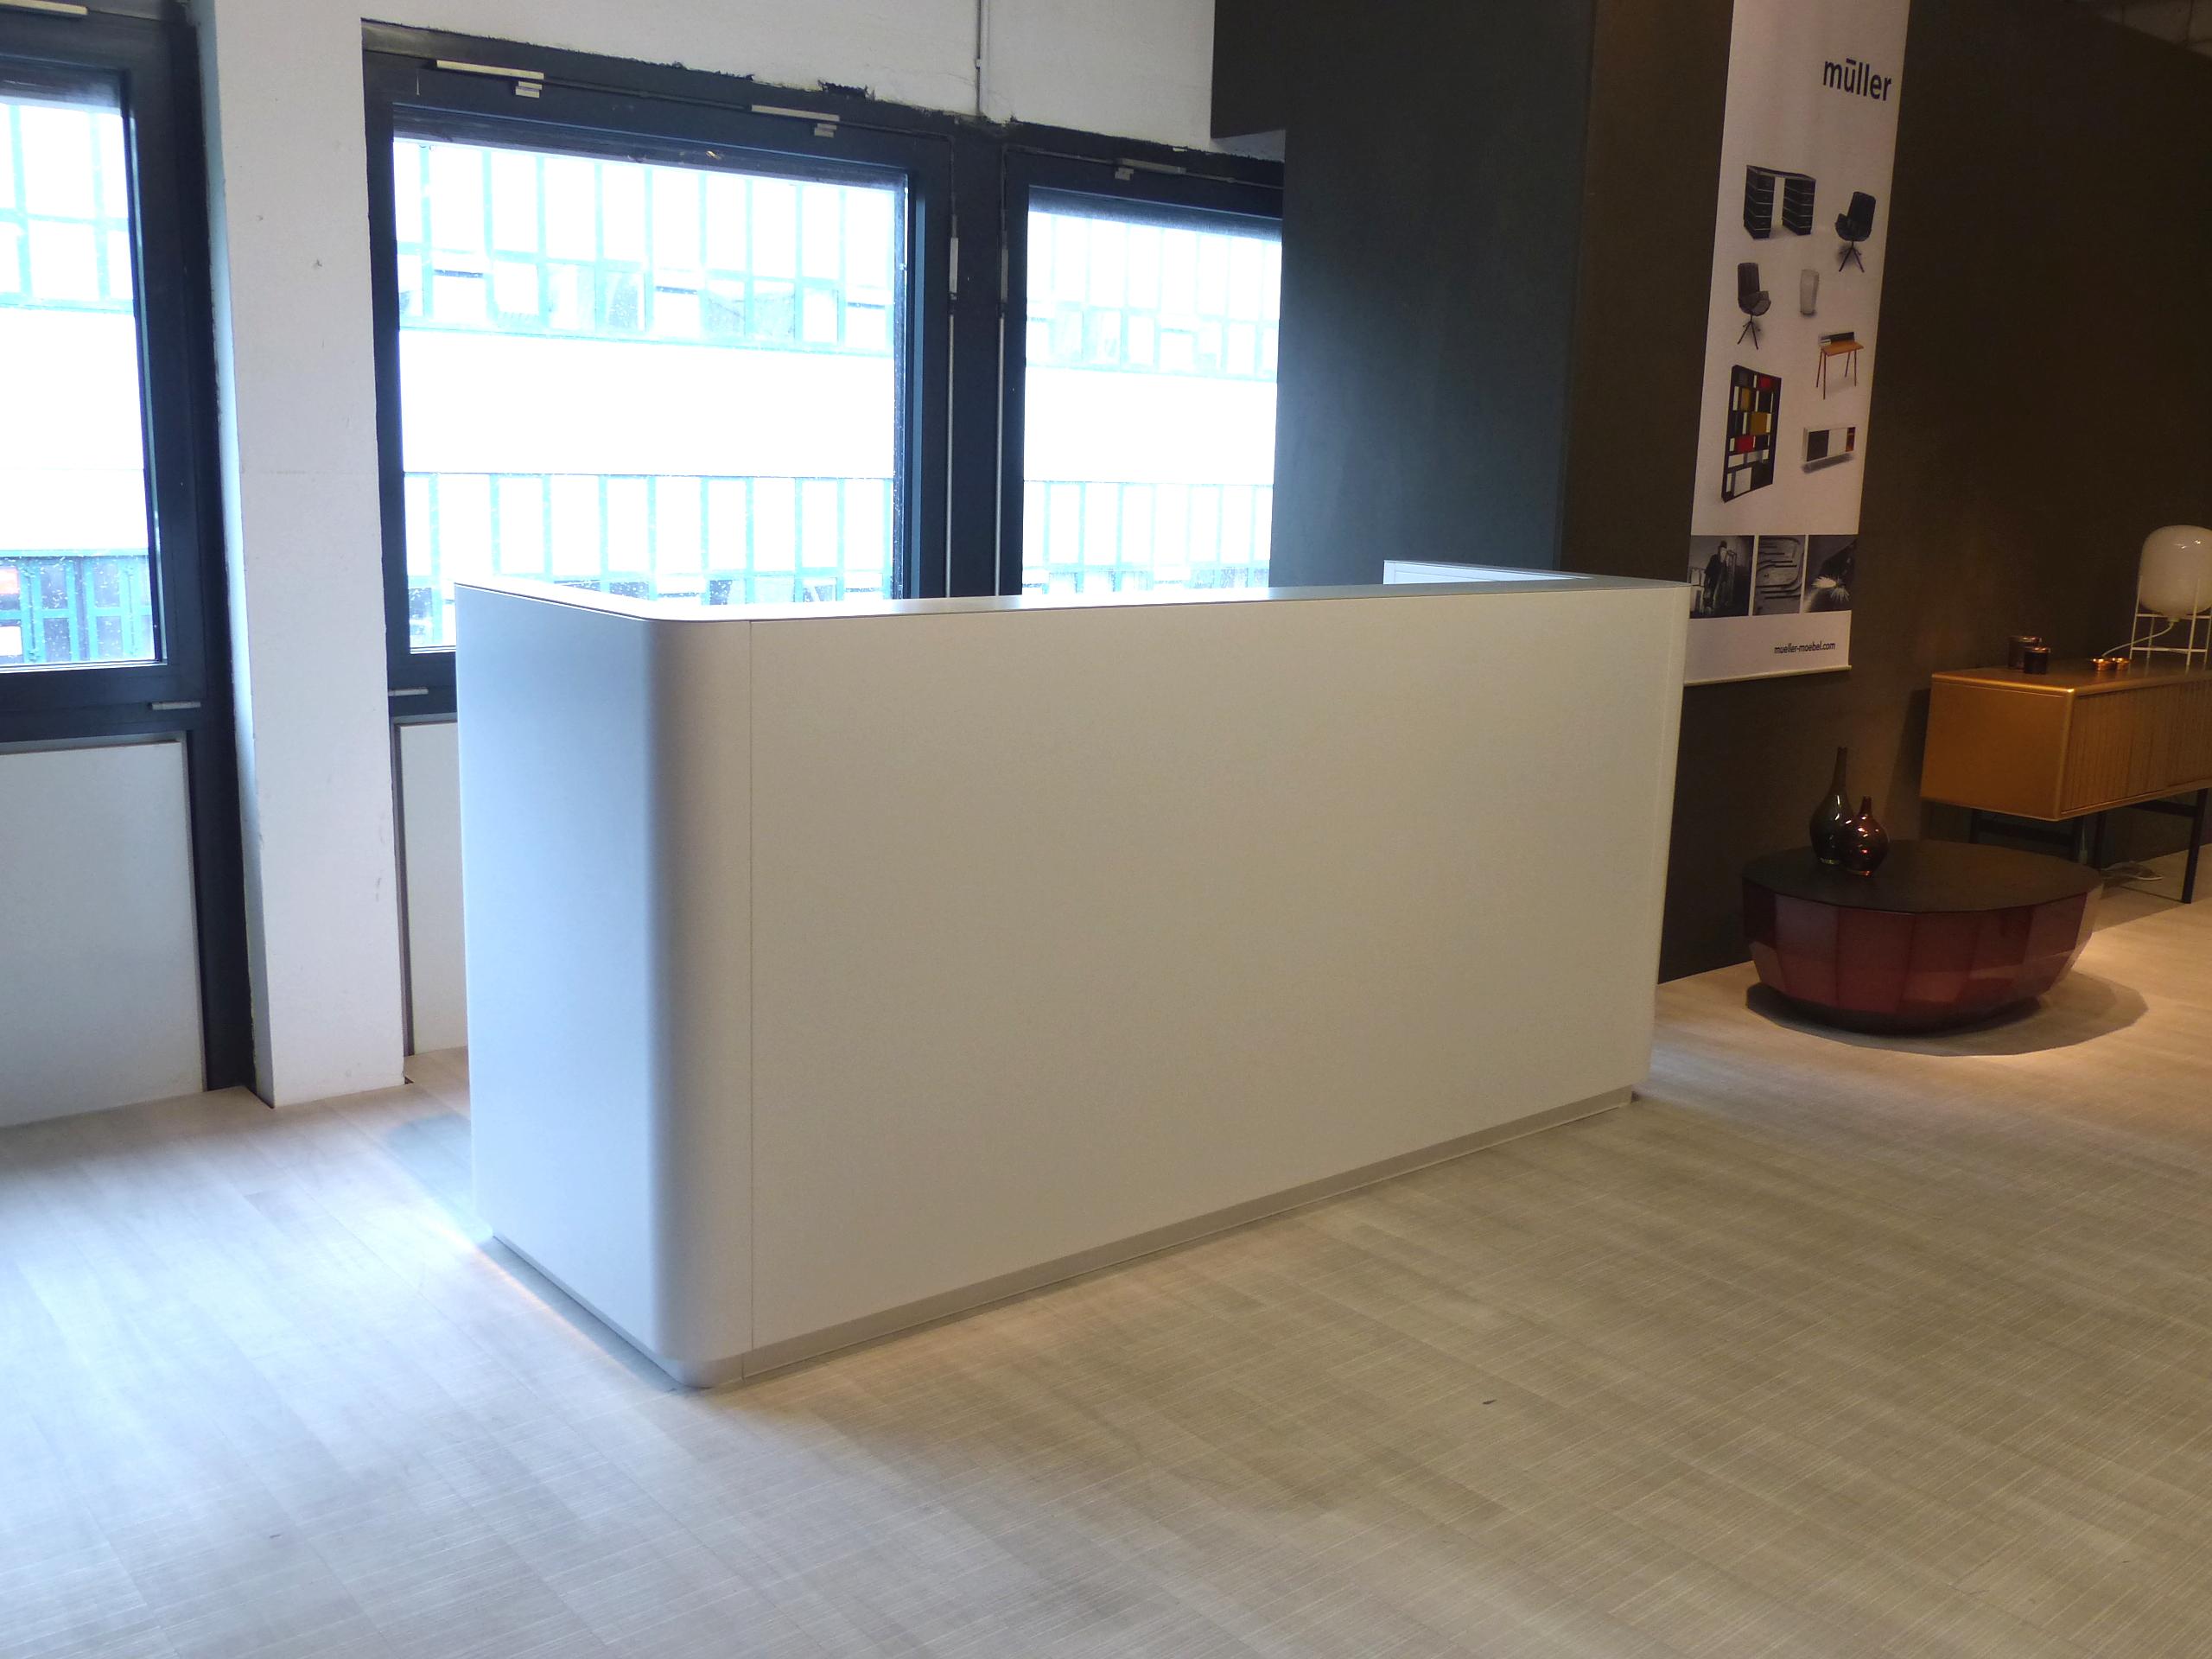 müller workspace lineare Empfangstheke weiß